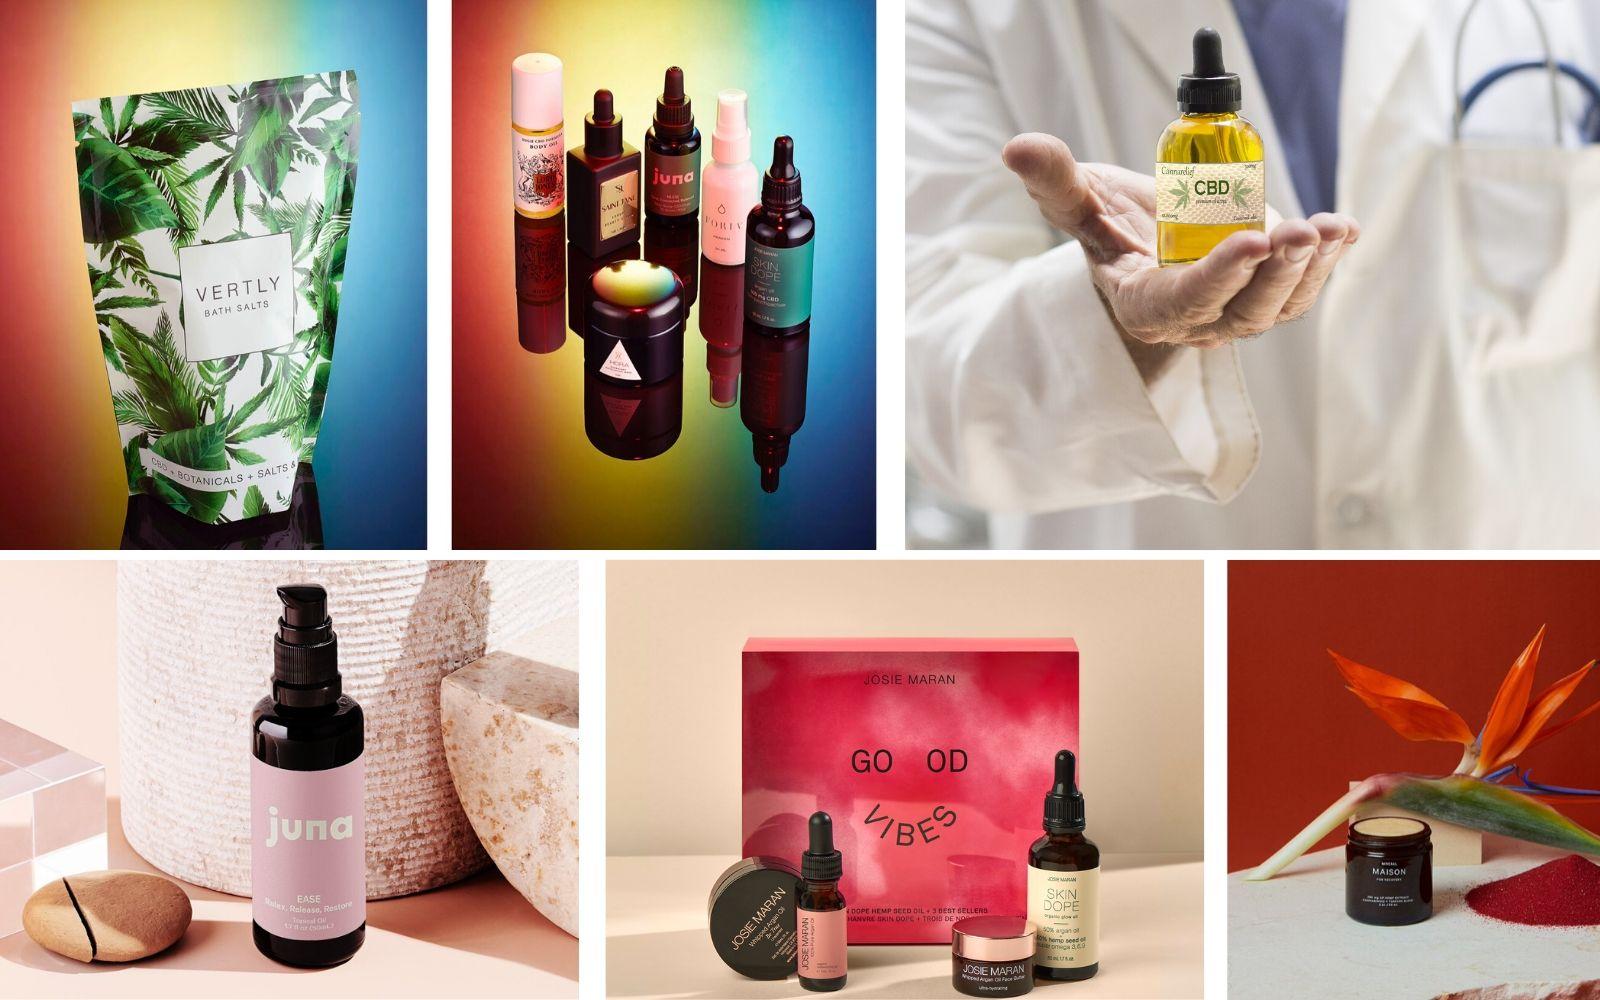 visualize products on alternative to ganja express